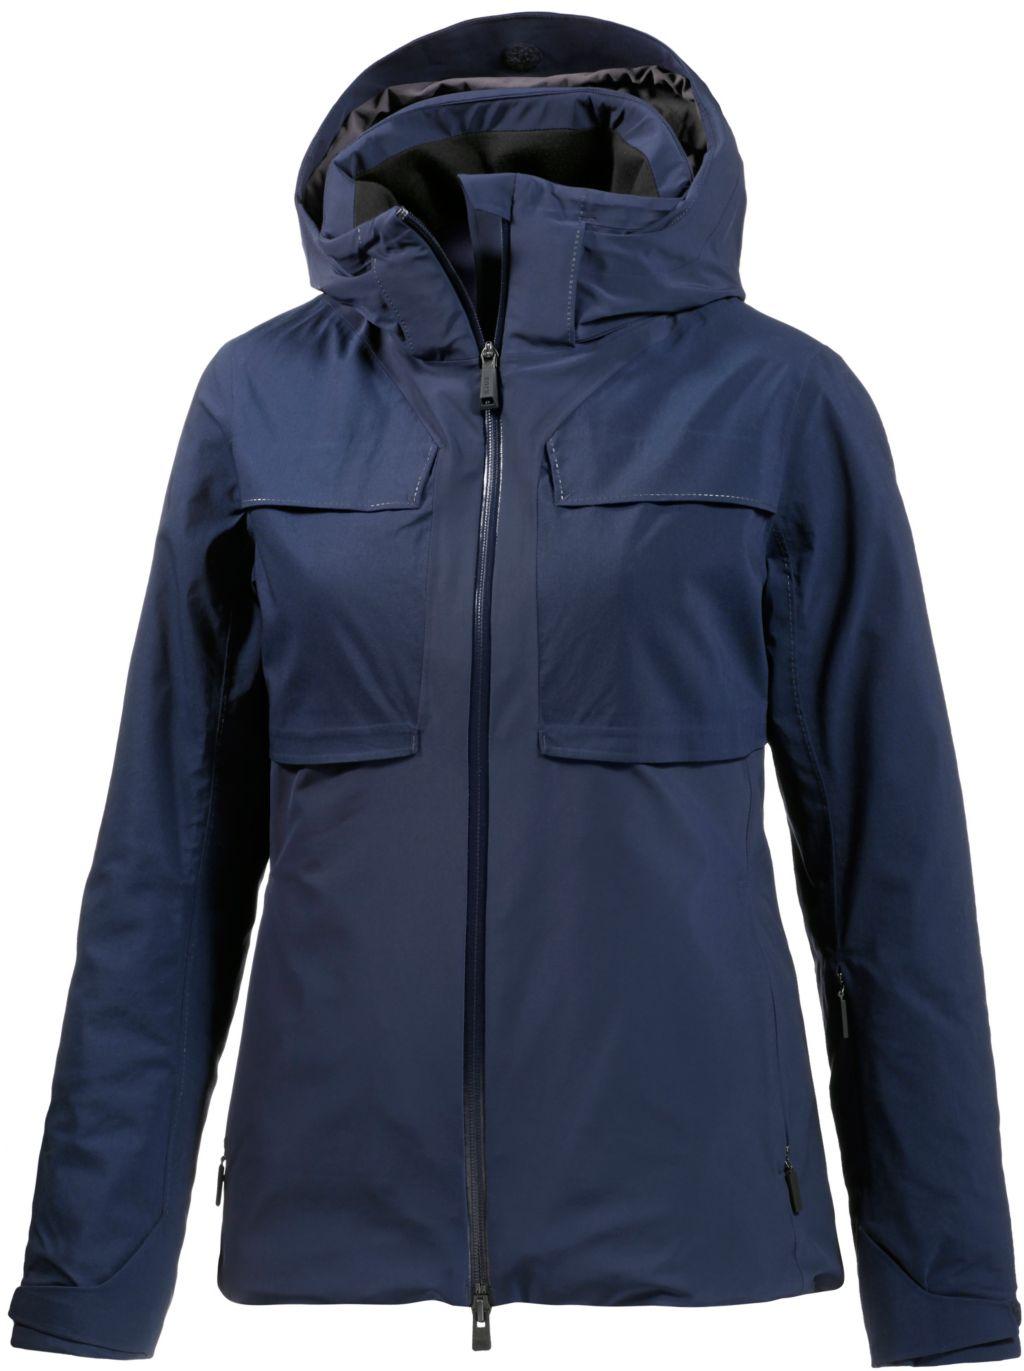 Borealis Skijacke Damen in blau, Größe 38